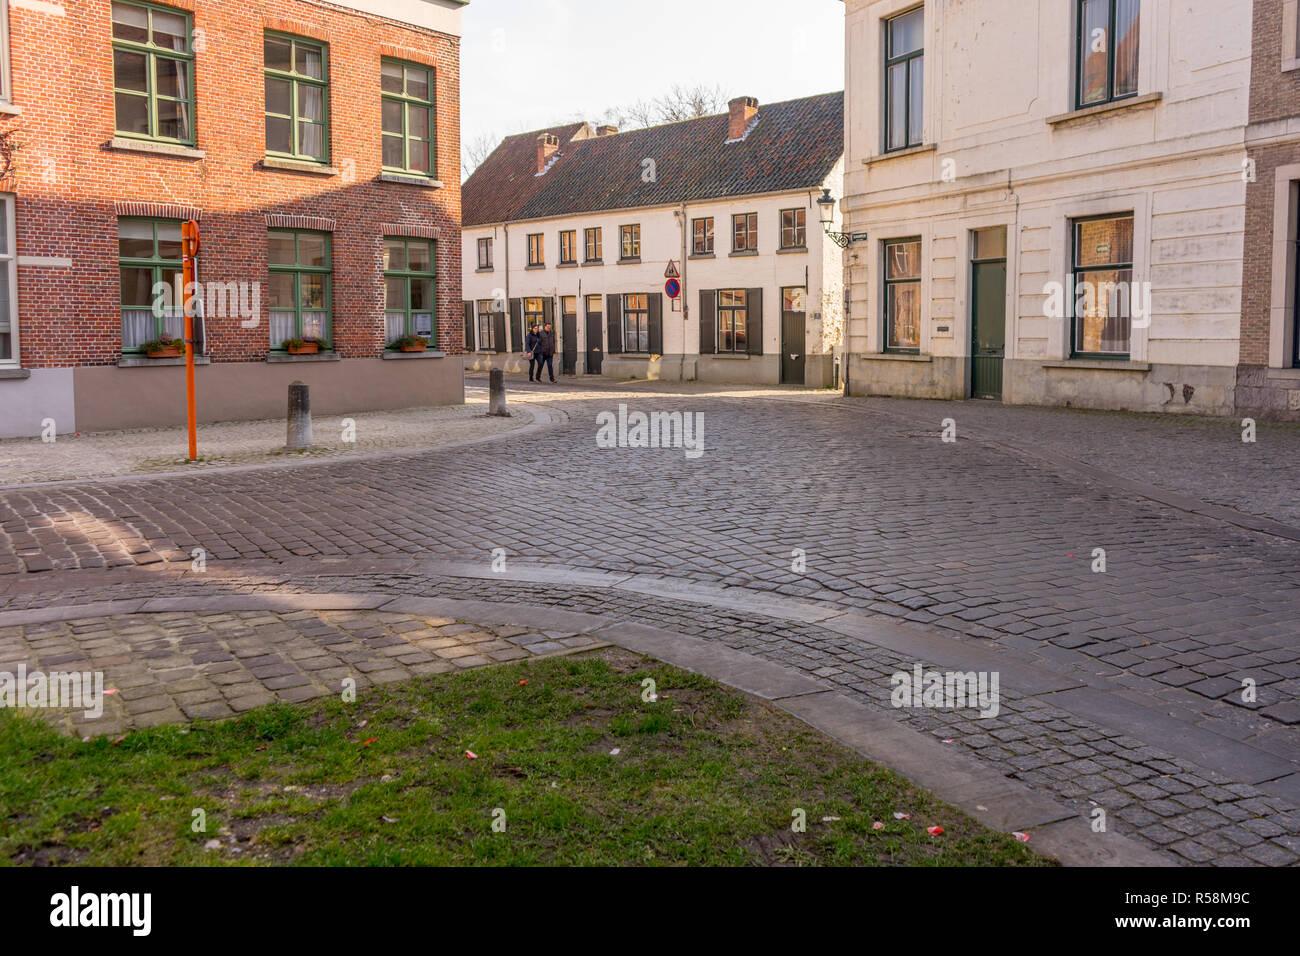 Belgium Street Front Stock Photos & Belgium Street Front